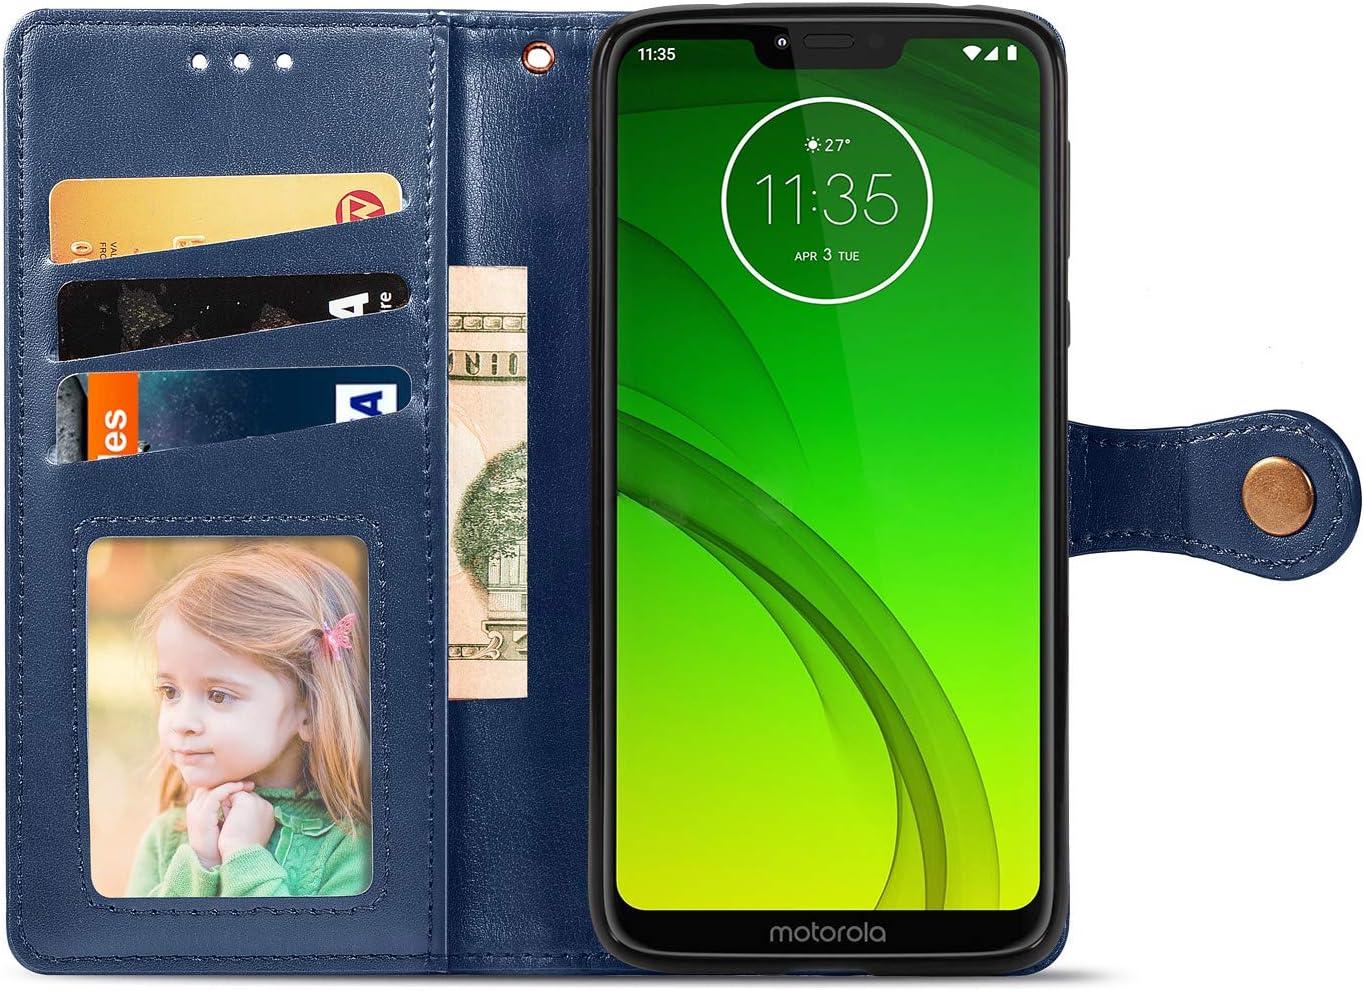 Tosim Moto G7Play H/ülle Klappbar Leder Brieftasche Handyh/ülle Klapph/ülle mit Kartenhalter Stossfest Lederh/ülle f/ür Motorola Moto G7 Play TOSDA010356 Schwarz